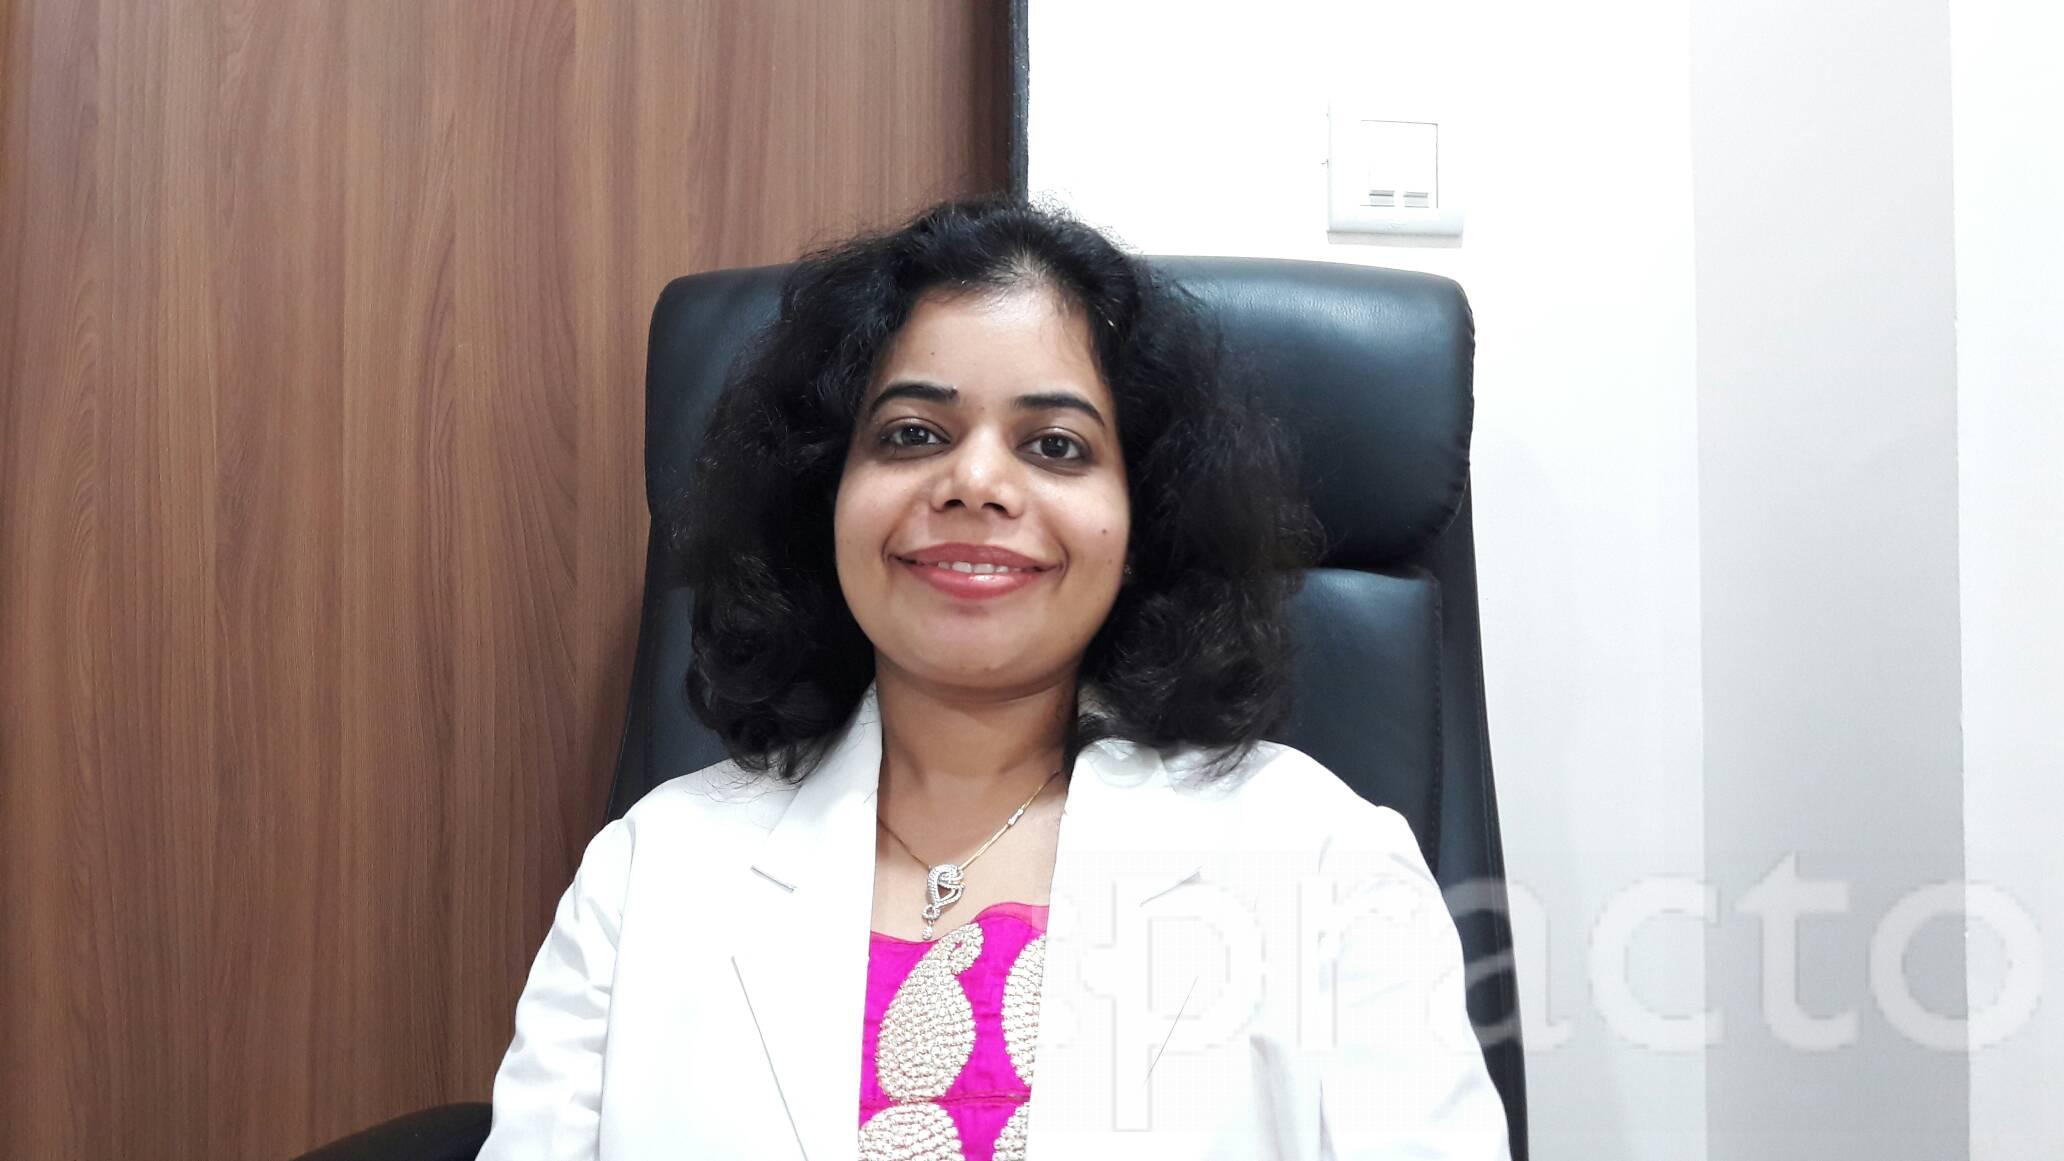 Dr. Anshul Jain - Dermatologist